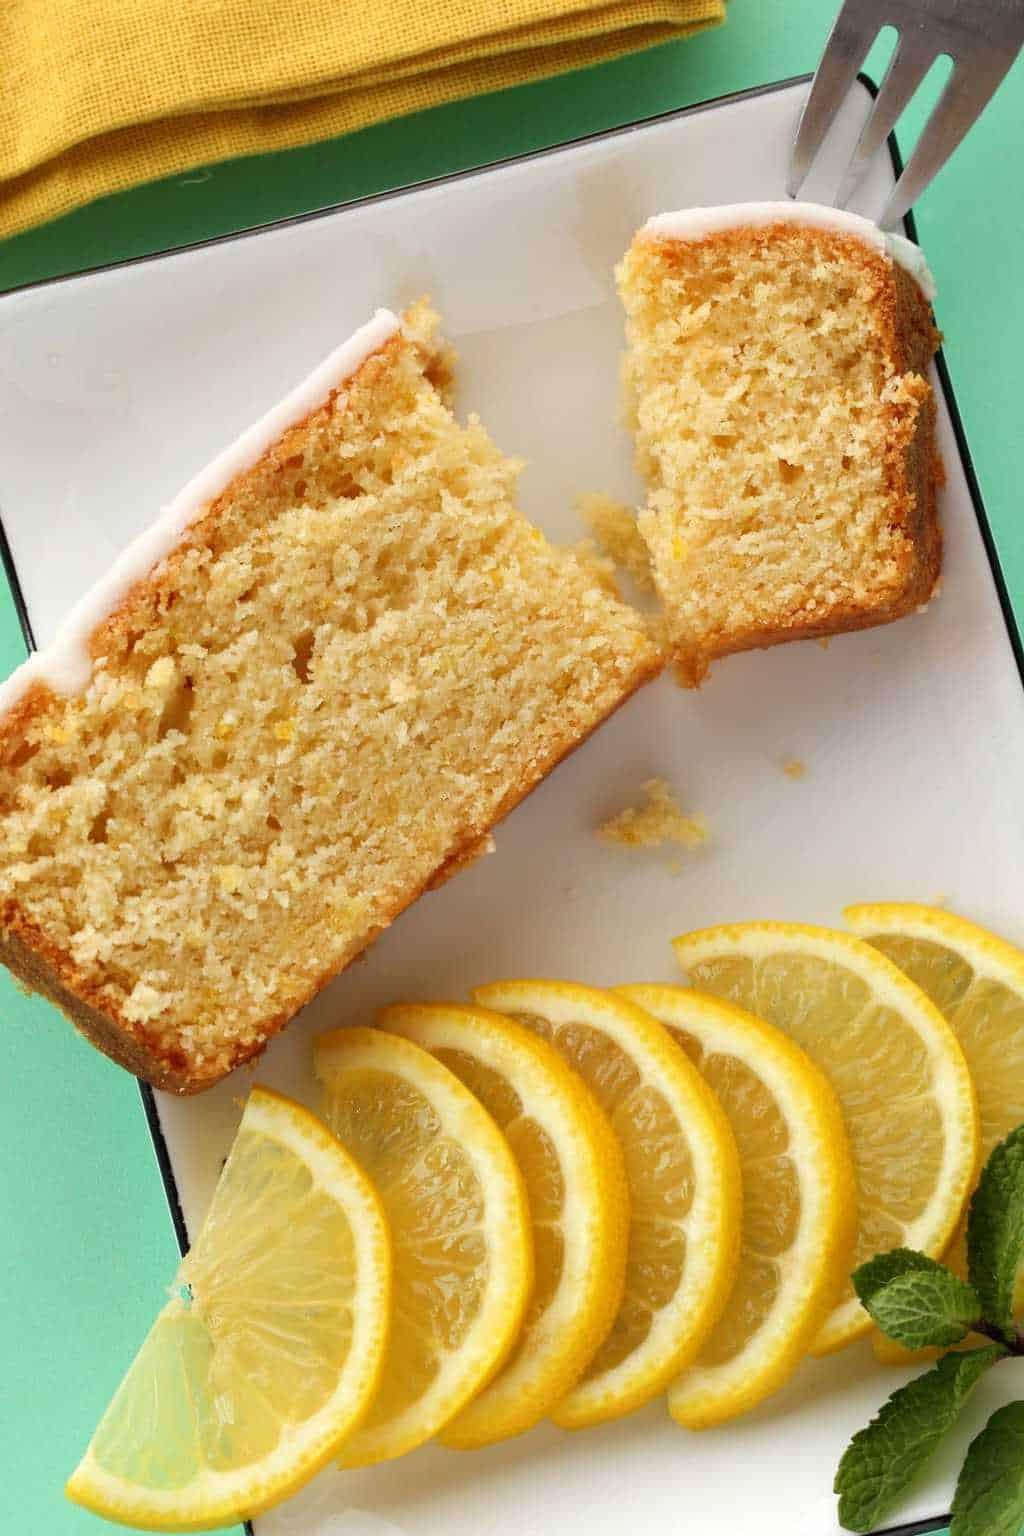 Vegan Lemon Cake Recipes  Vegan Lemon Pound Cake with Lemon Glaze Loving It Vegan